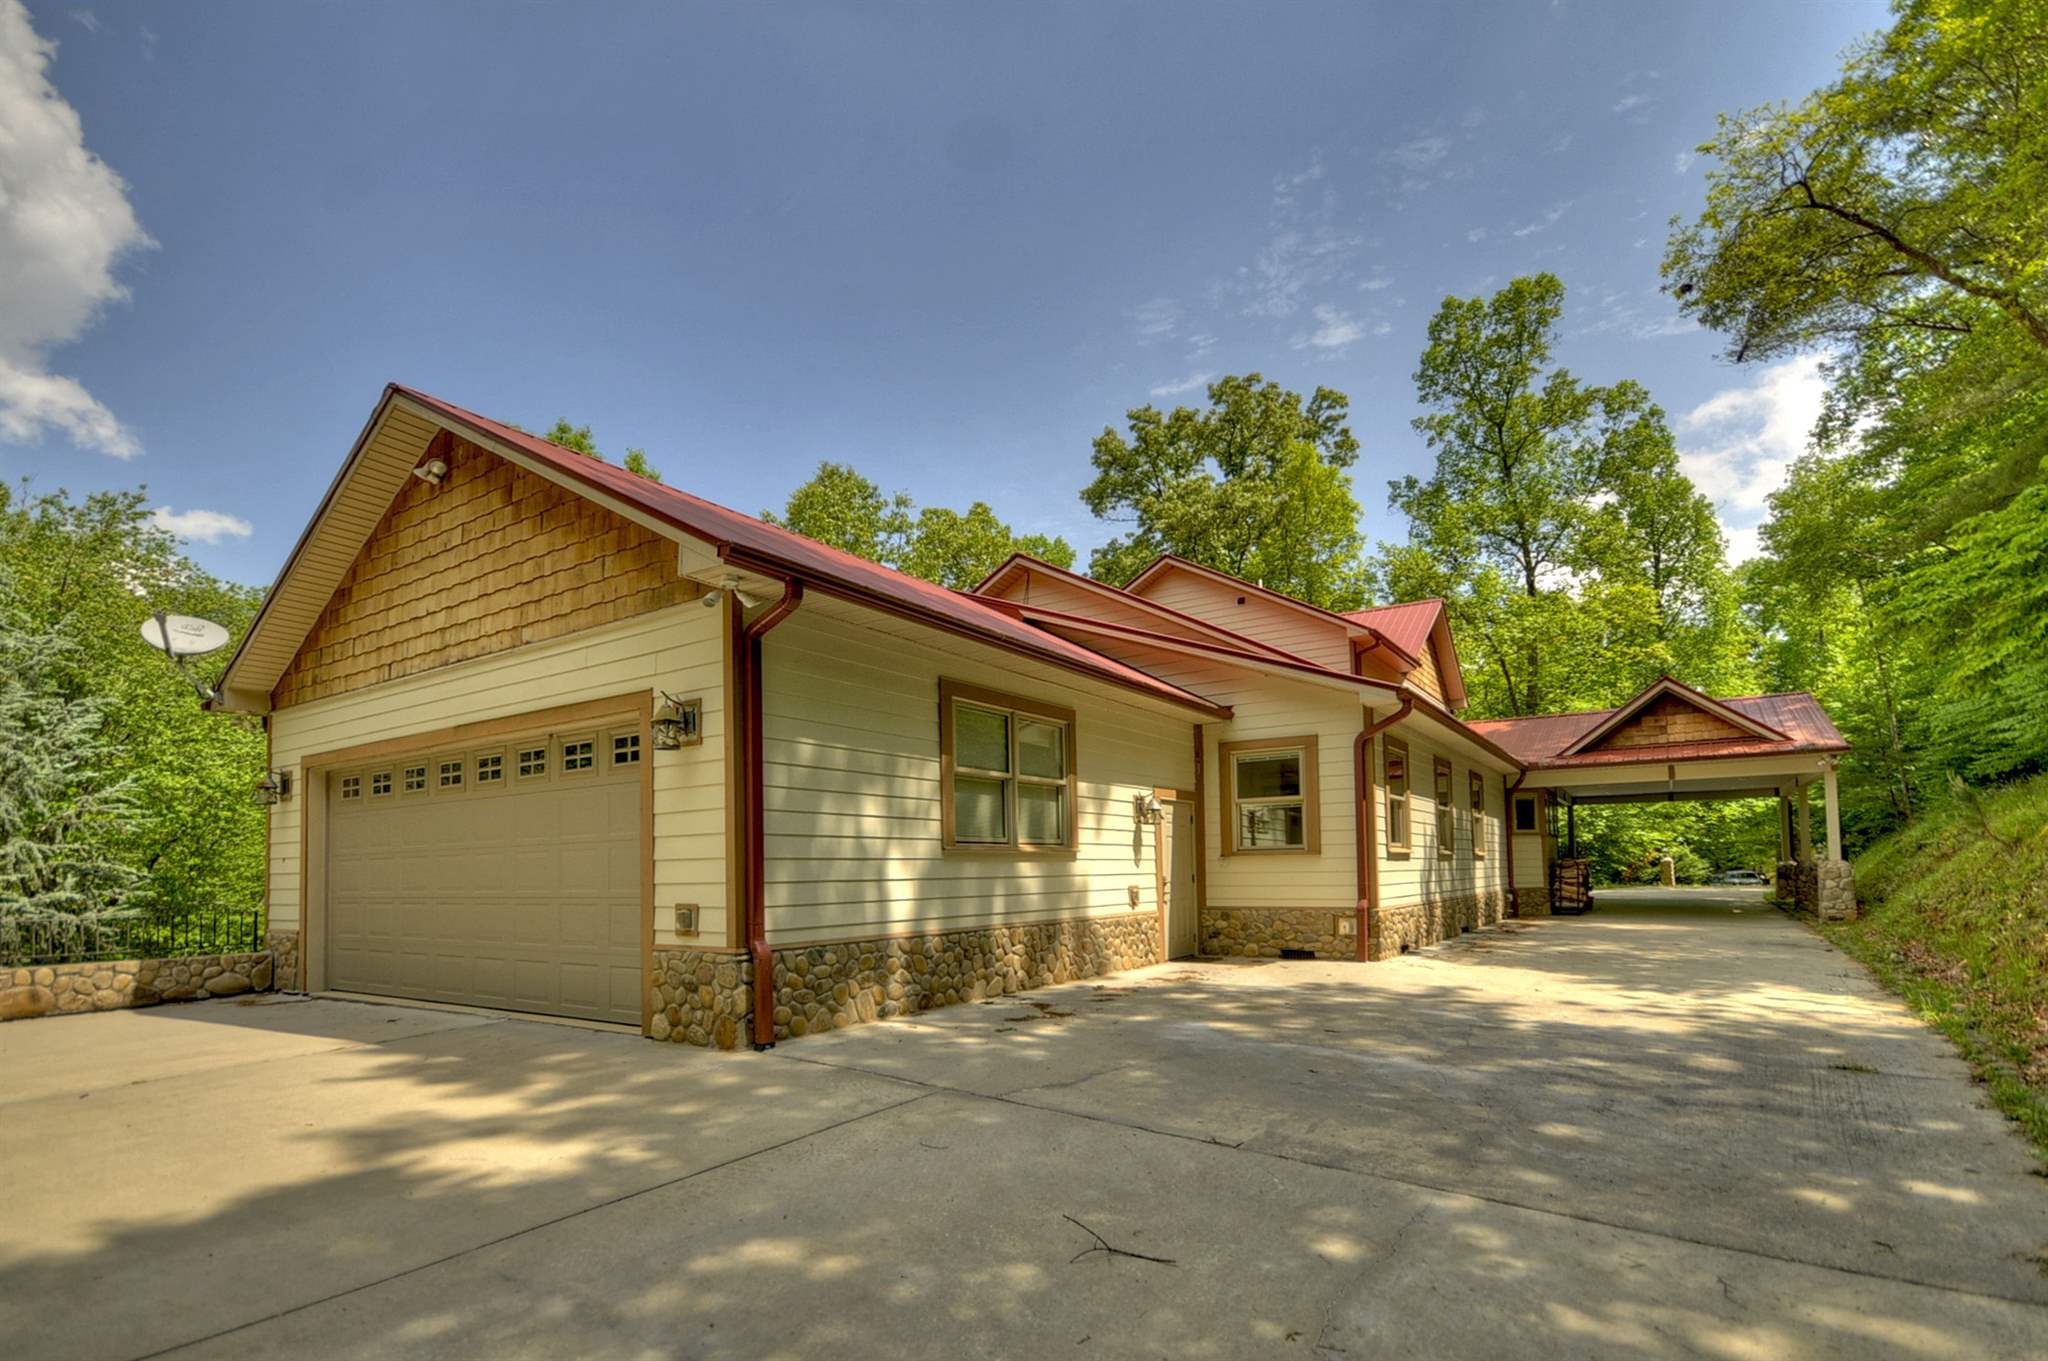 252 Creekmont Drive, Blairsville, GA 30512